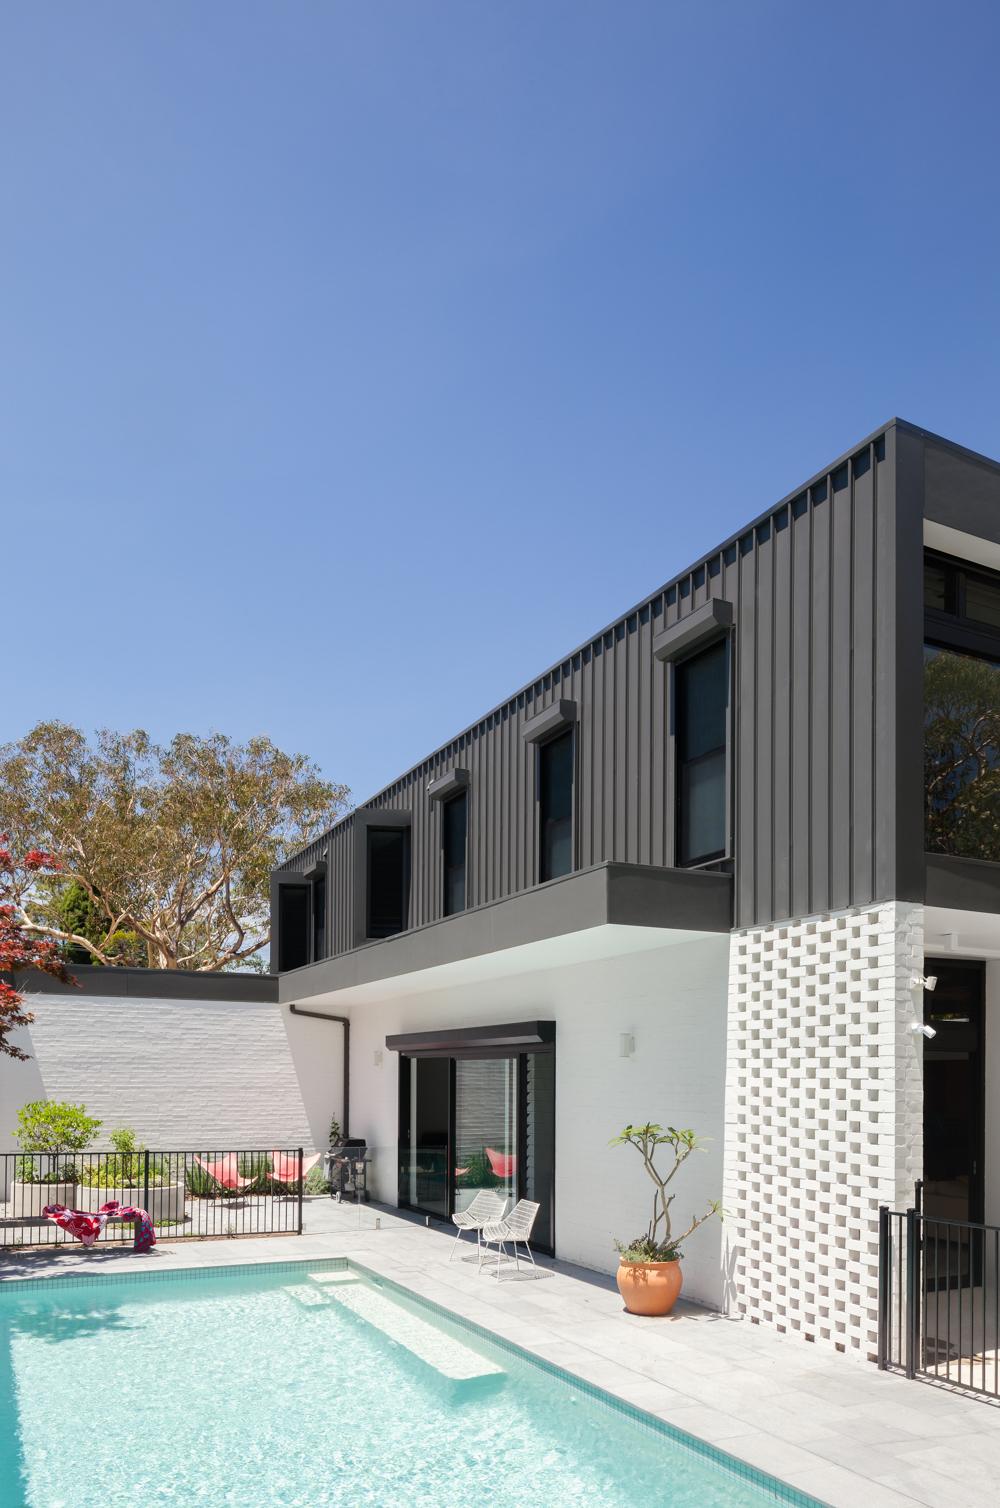 turramurra-house=noxon-giffen-architects-the-design-emotive--11.jpg